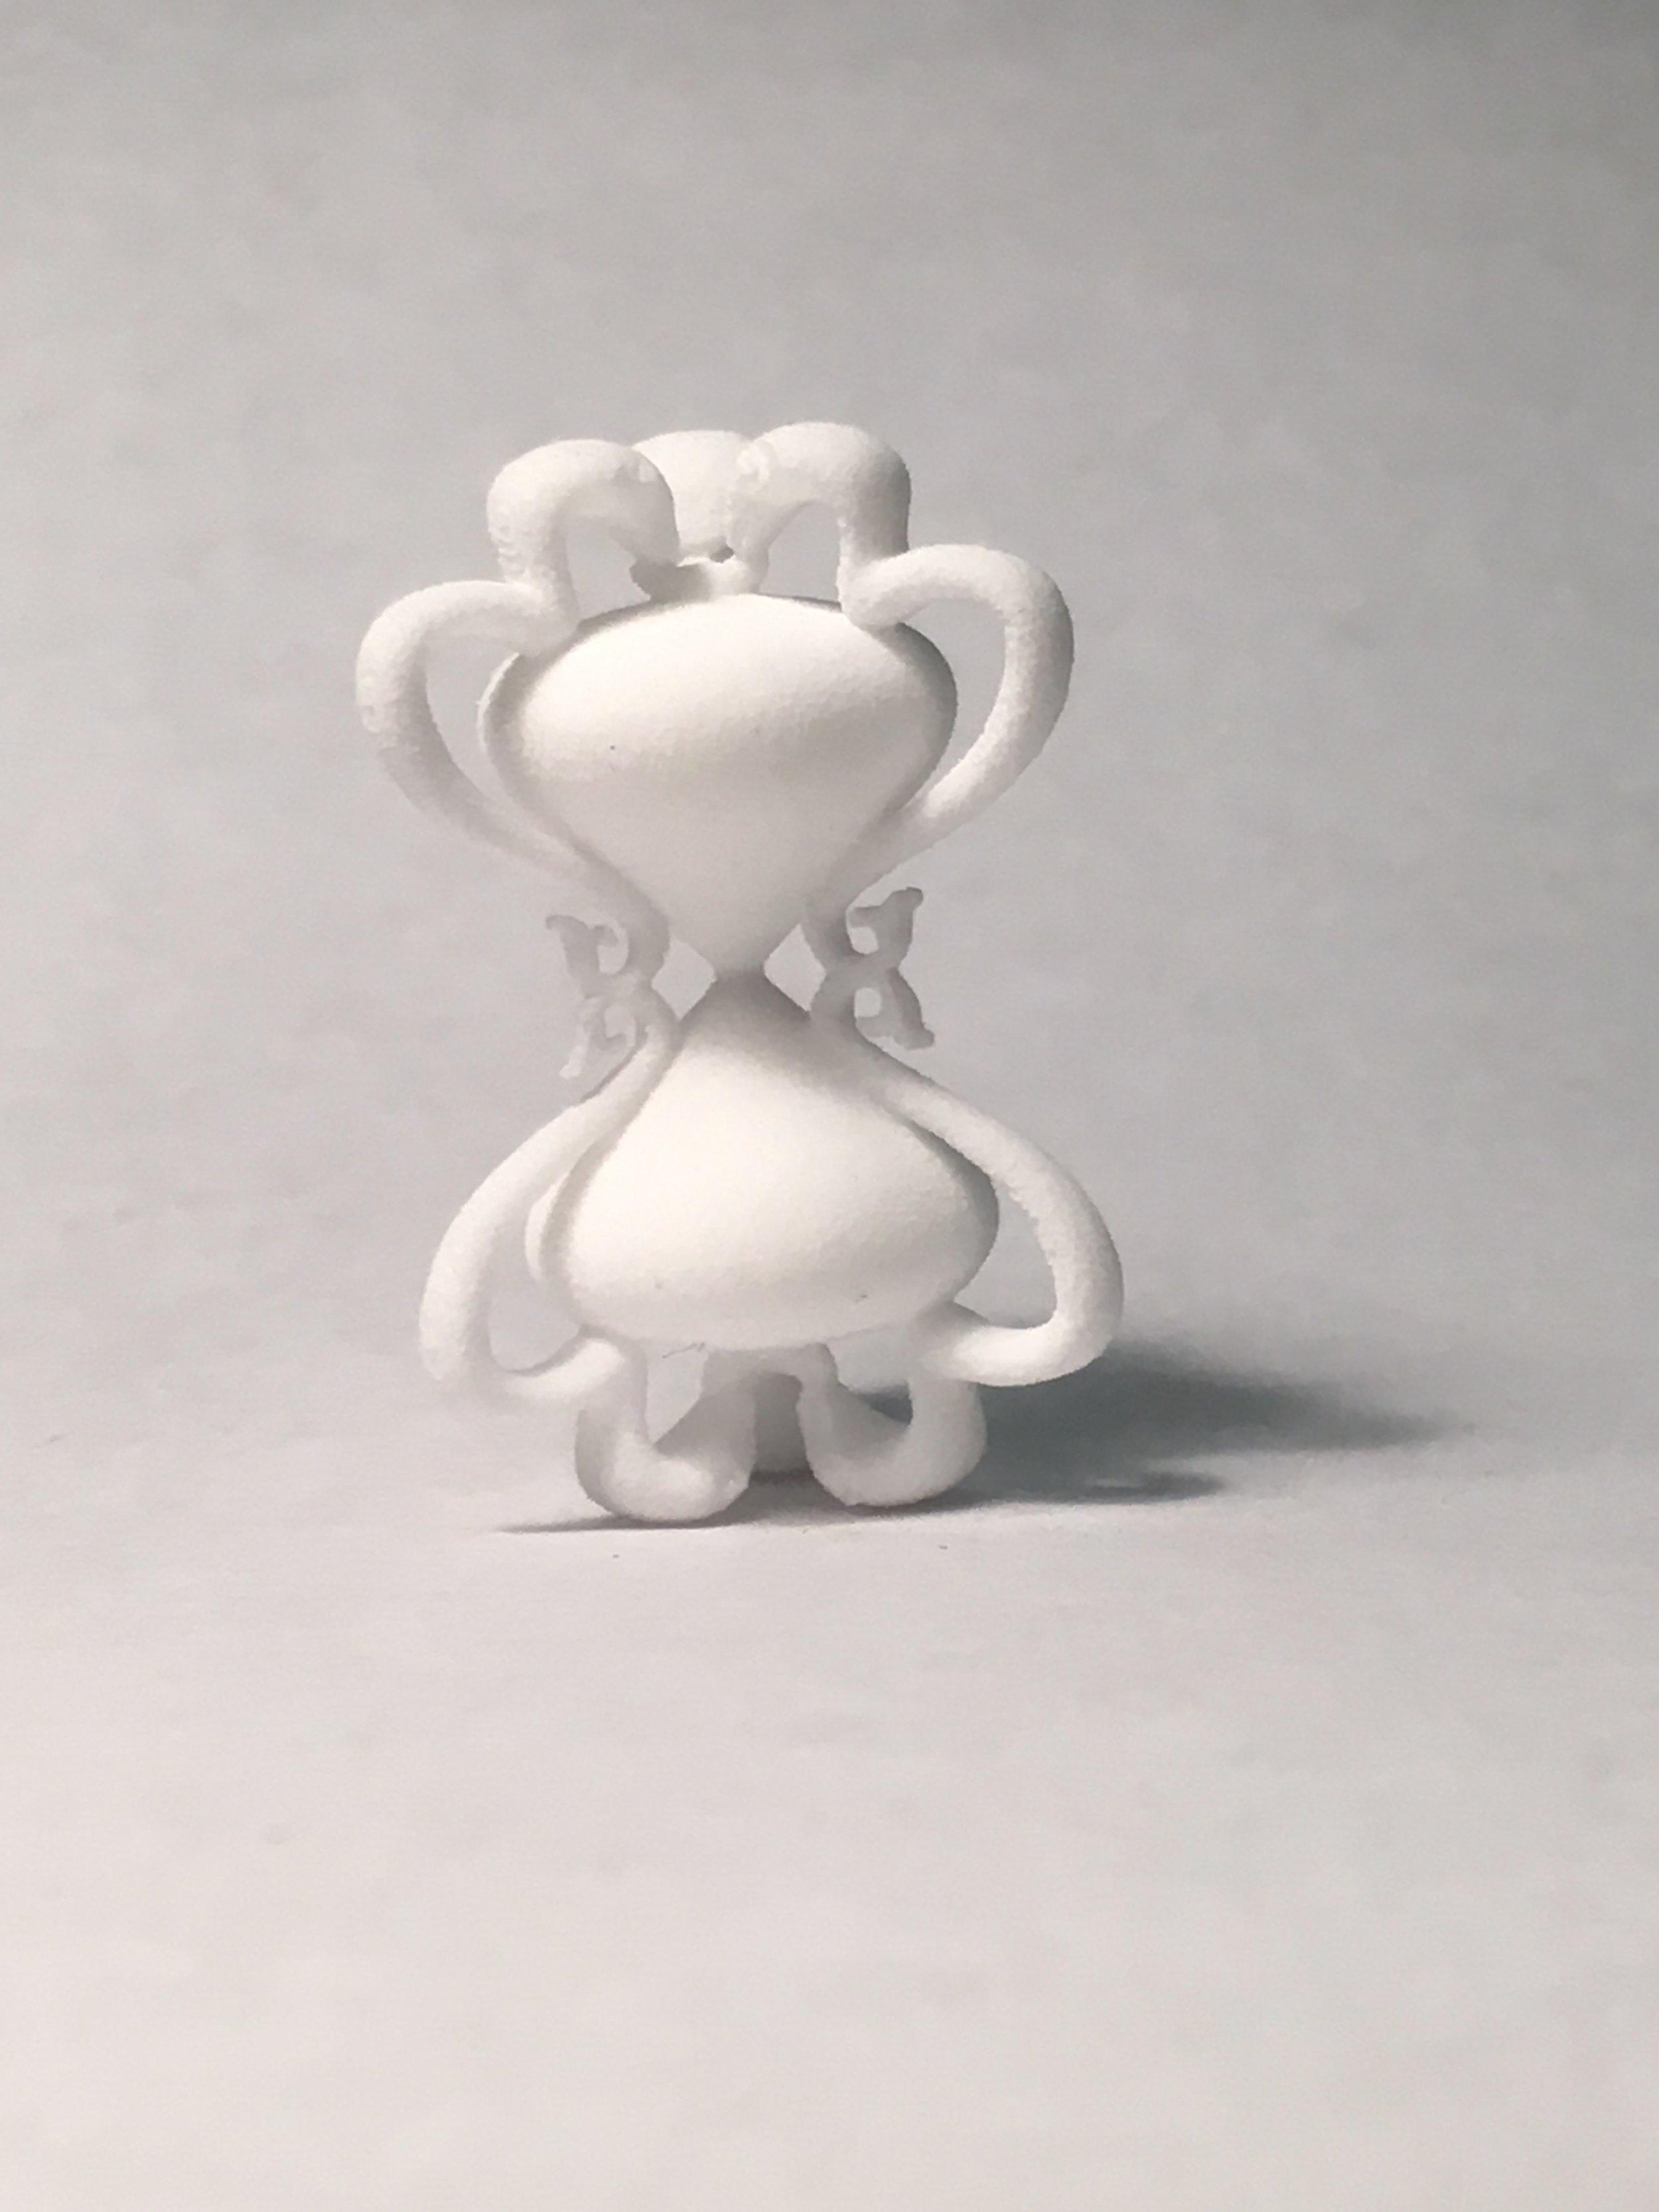 Nylon print from hourglass design.